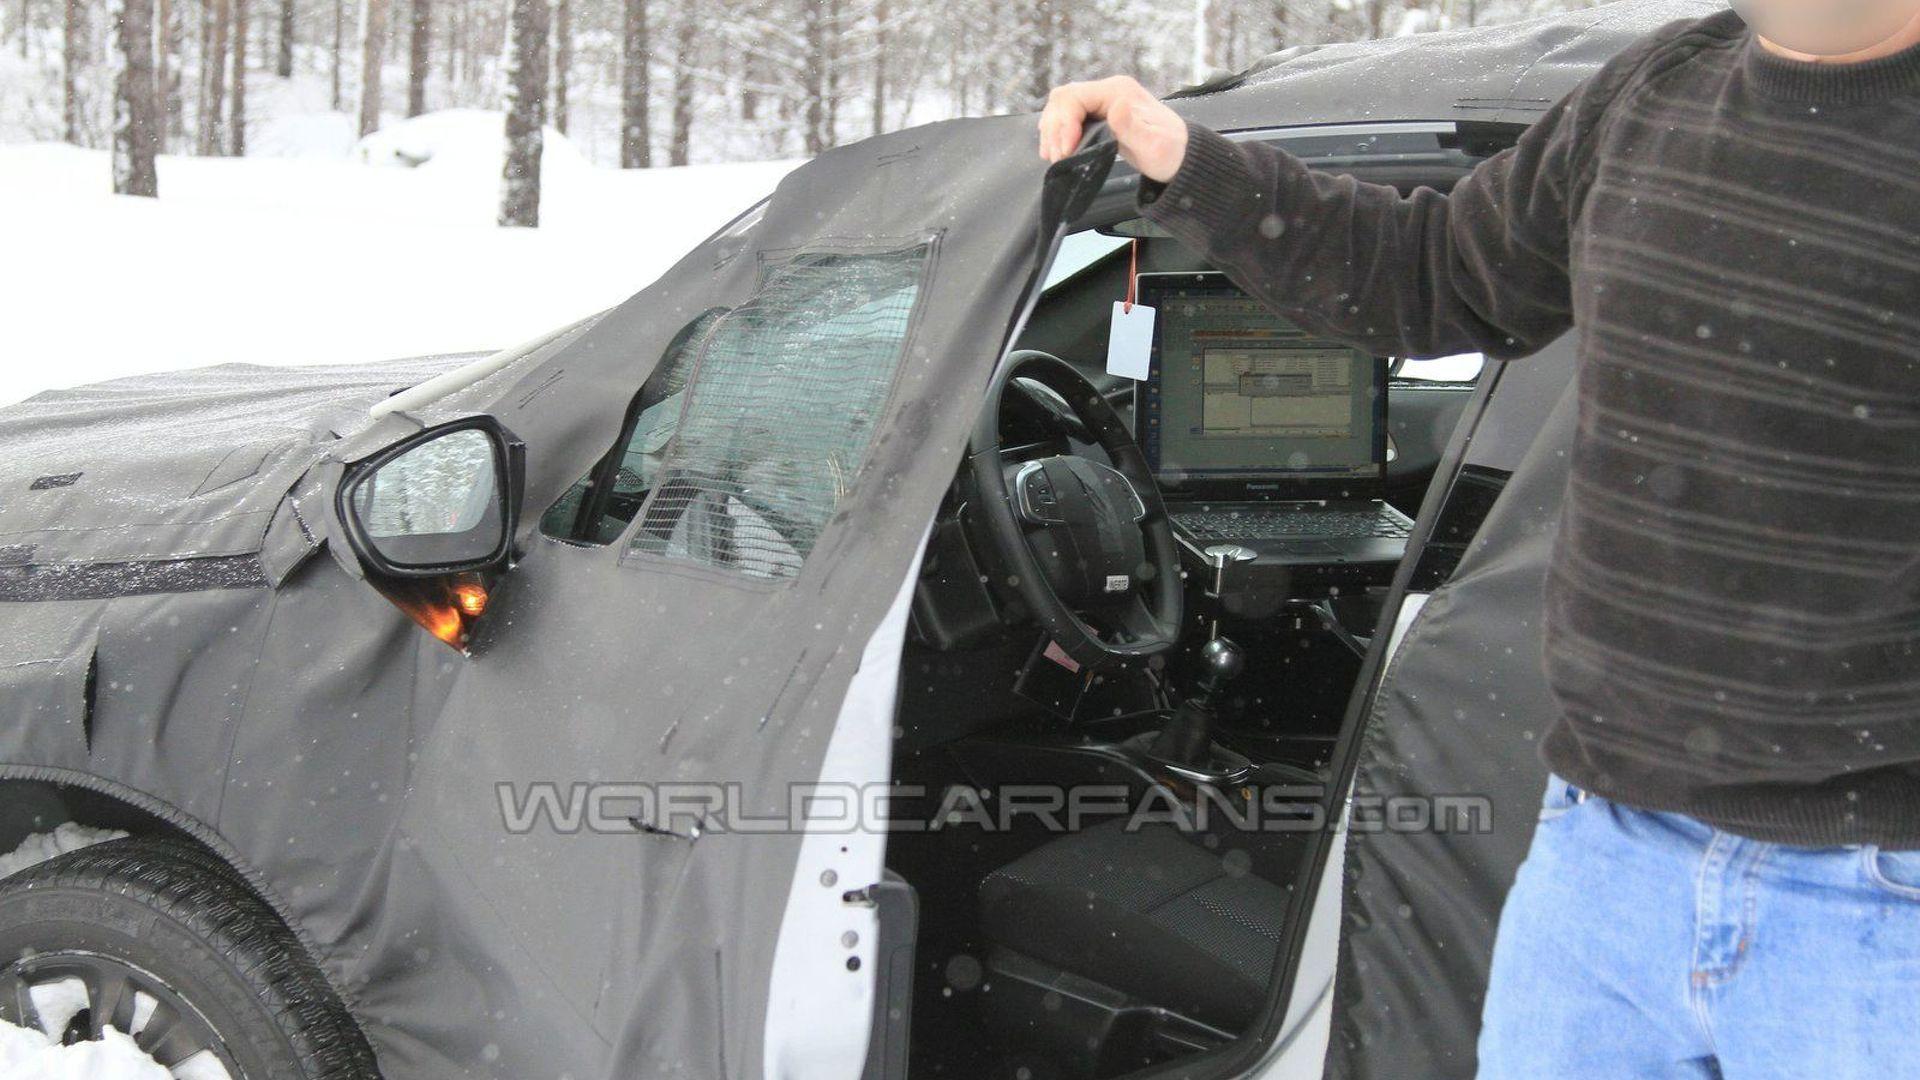 Citroen DS4 Pursued by Spy Photographer Loses Control - Reveals 5-door